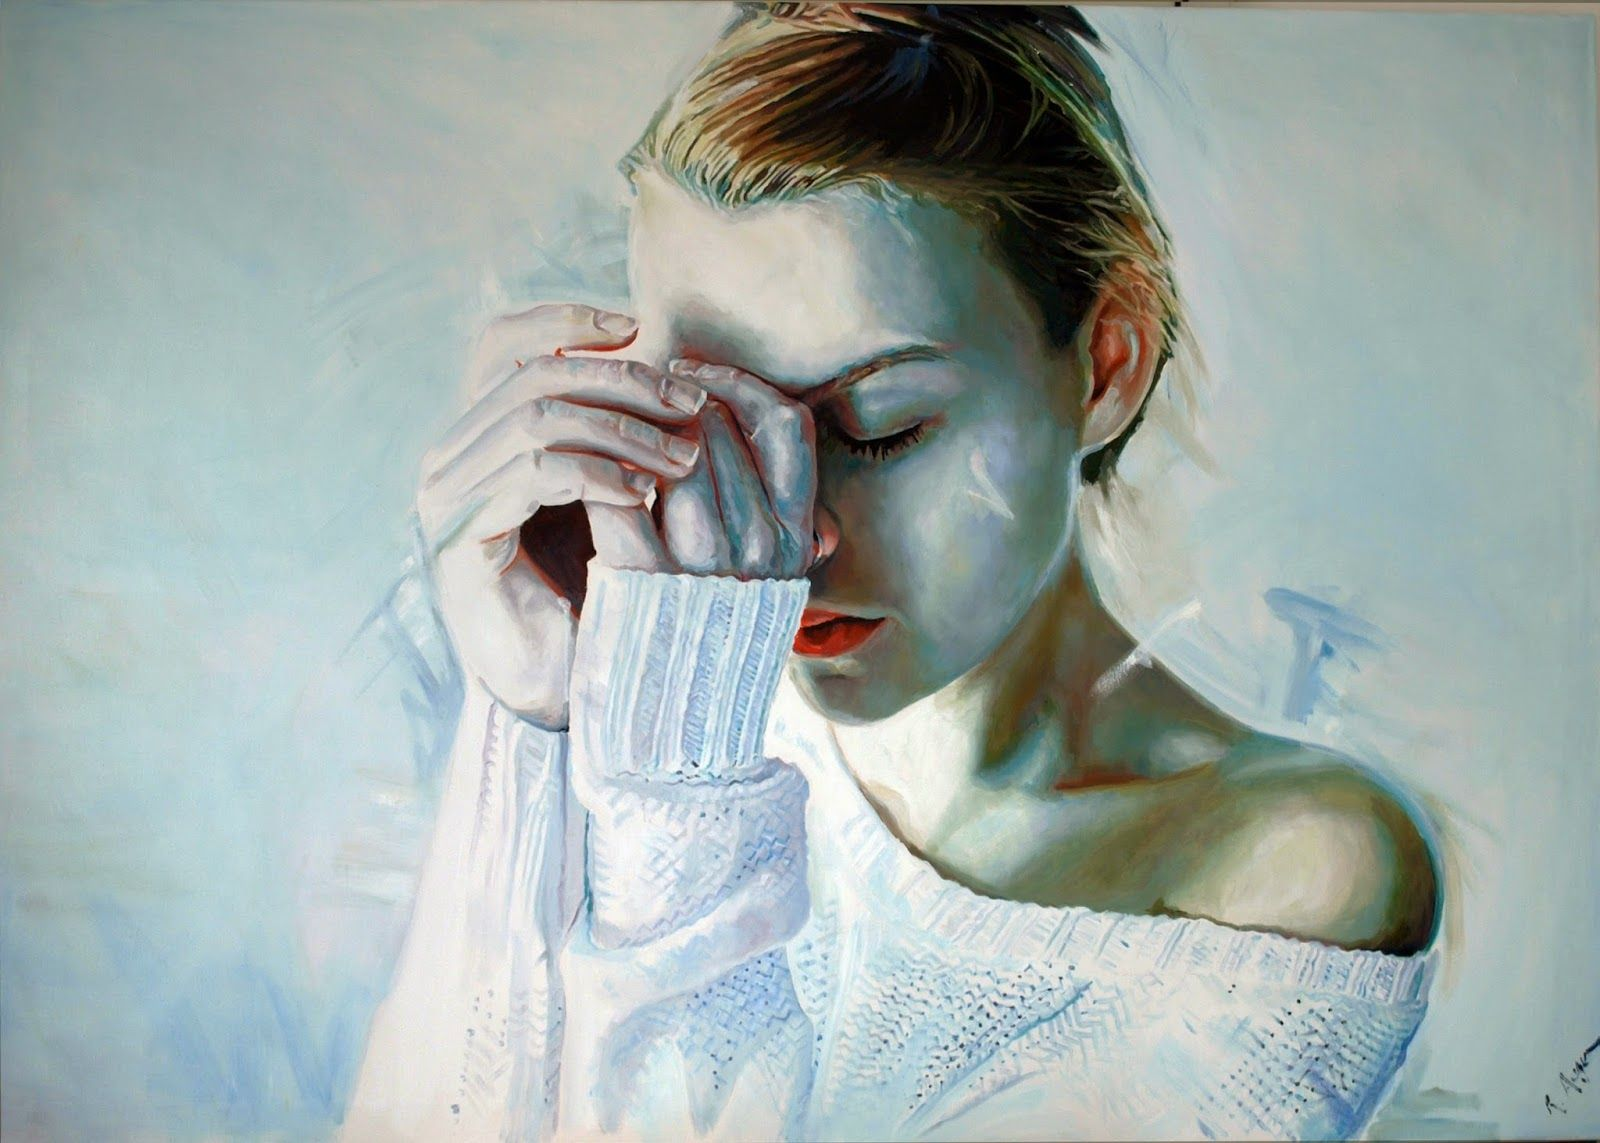 rainer augur - Google Search   Art, Painting, Fine art